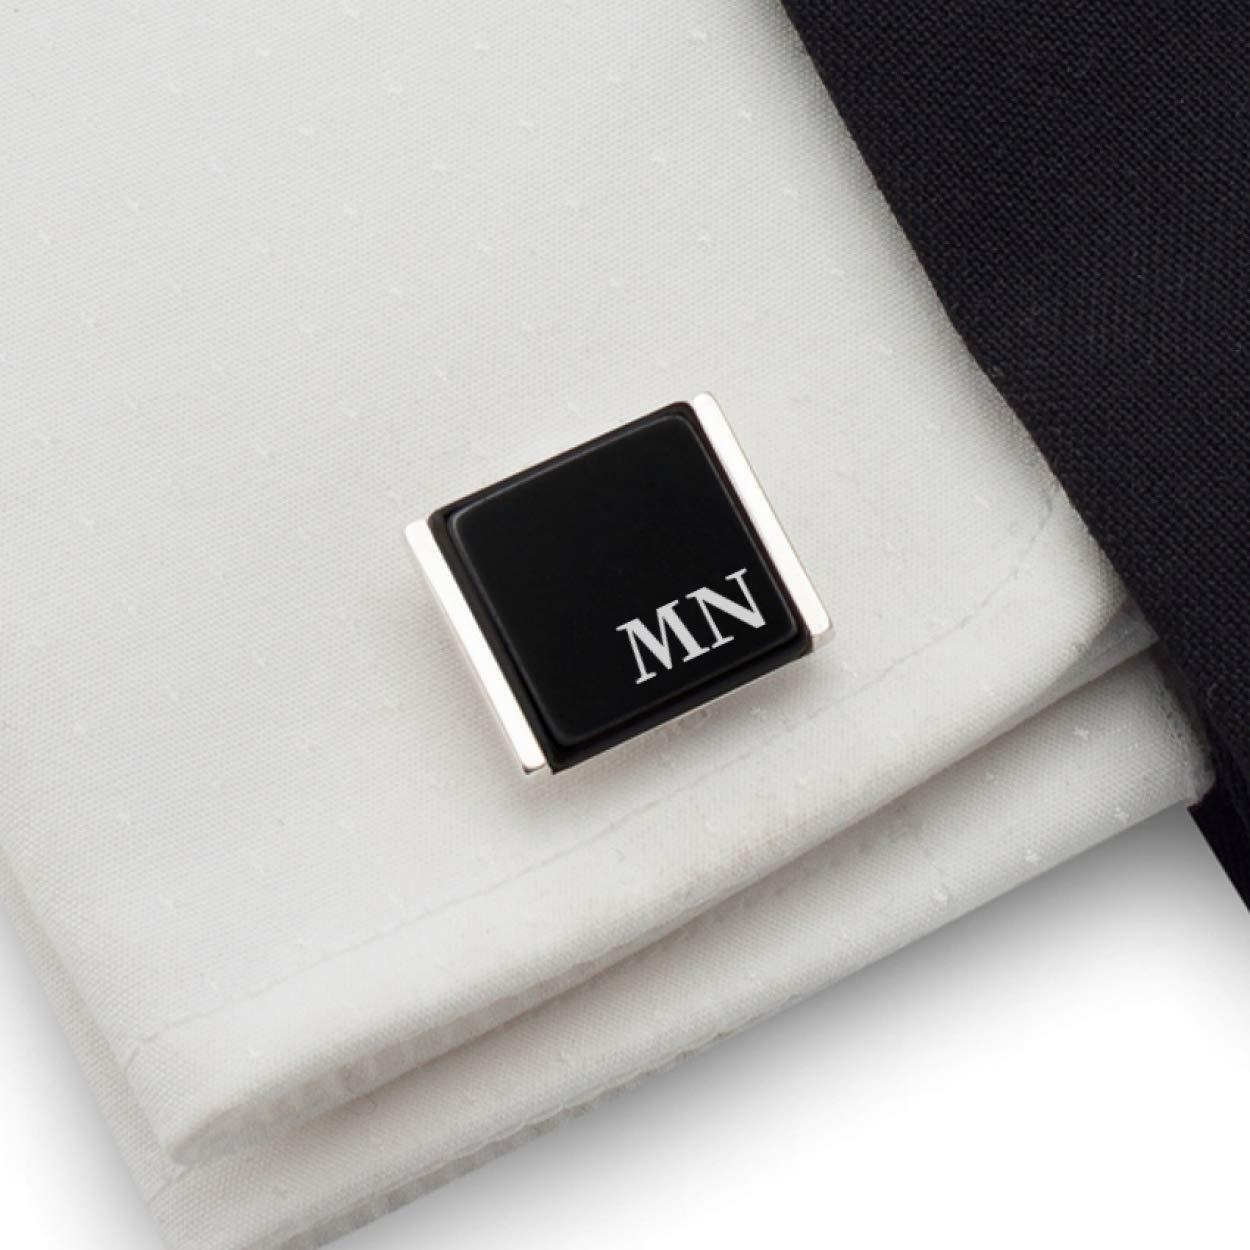 925 Solid Sterling Silver Natural Black Onyx Gemstone Cufflinks Black Onyx Gemstone Handmade Men/'s Cufflinks Jewelry Beautiful Gift